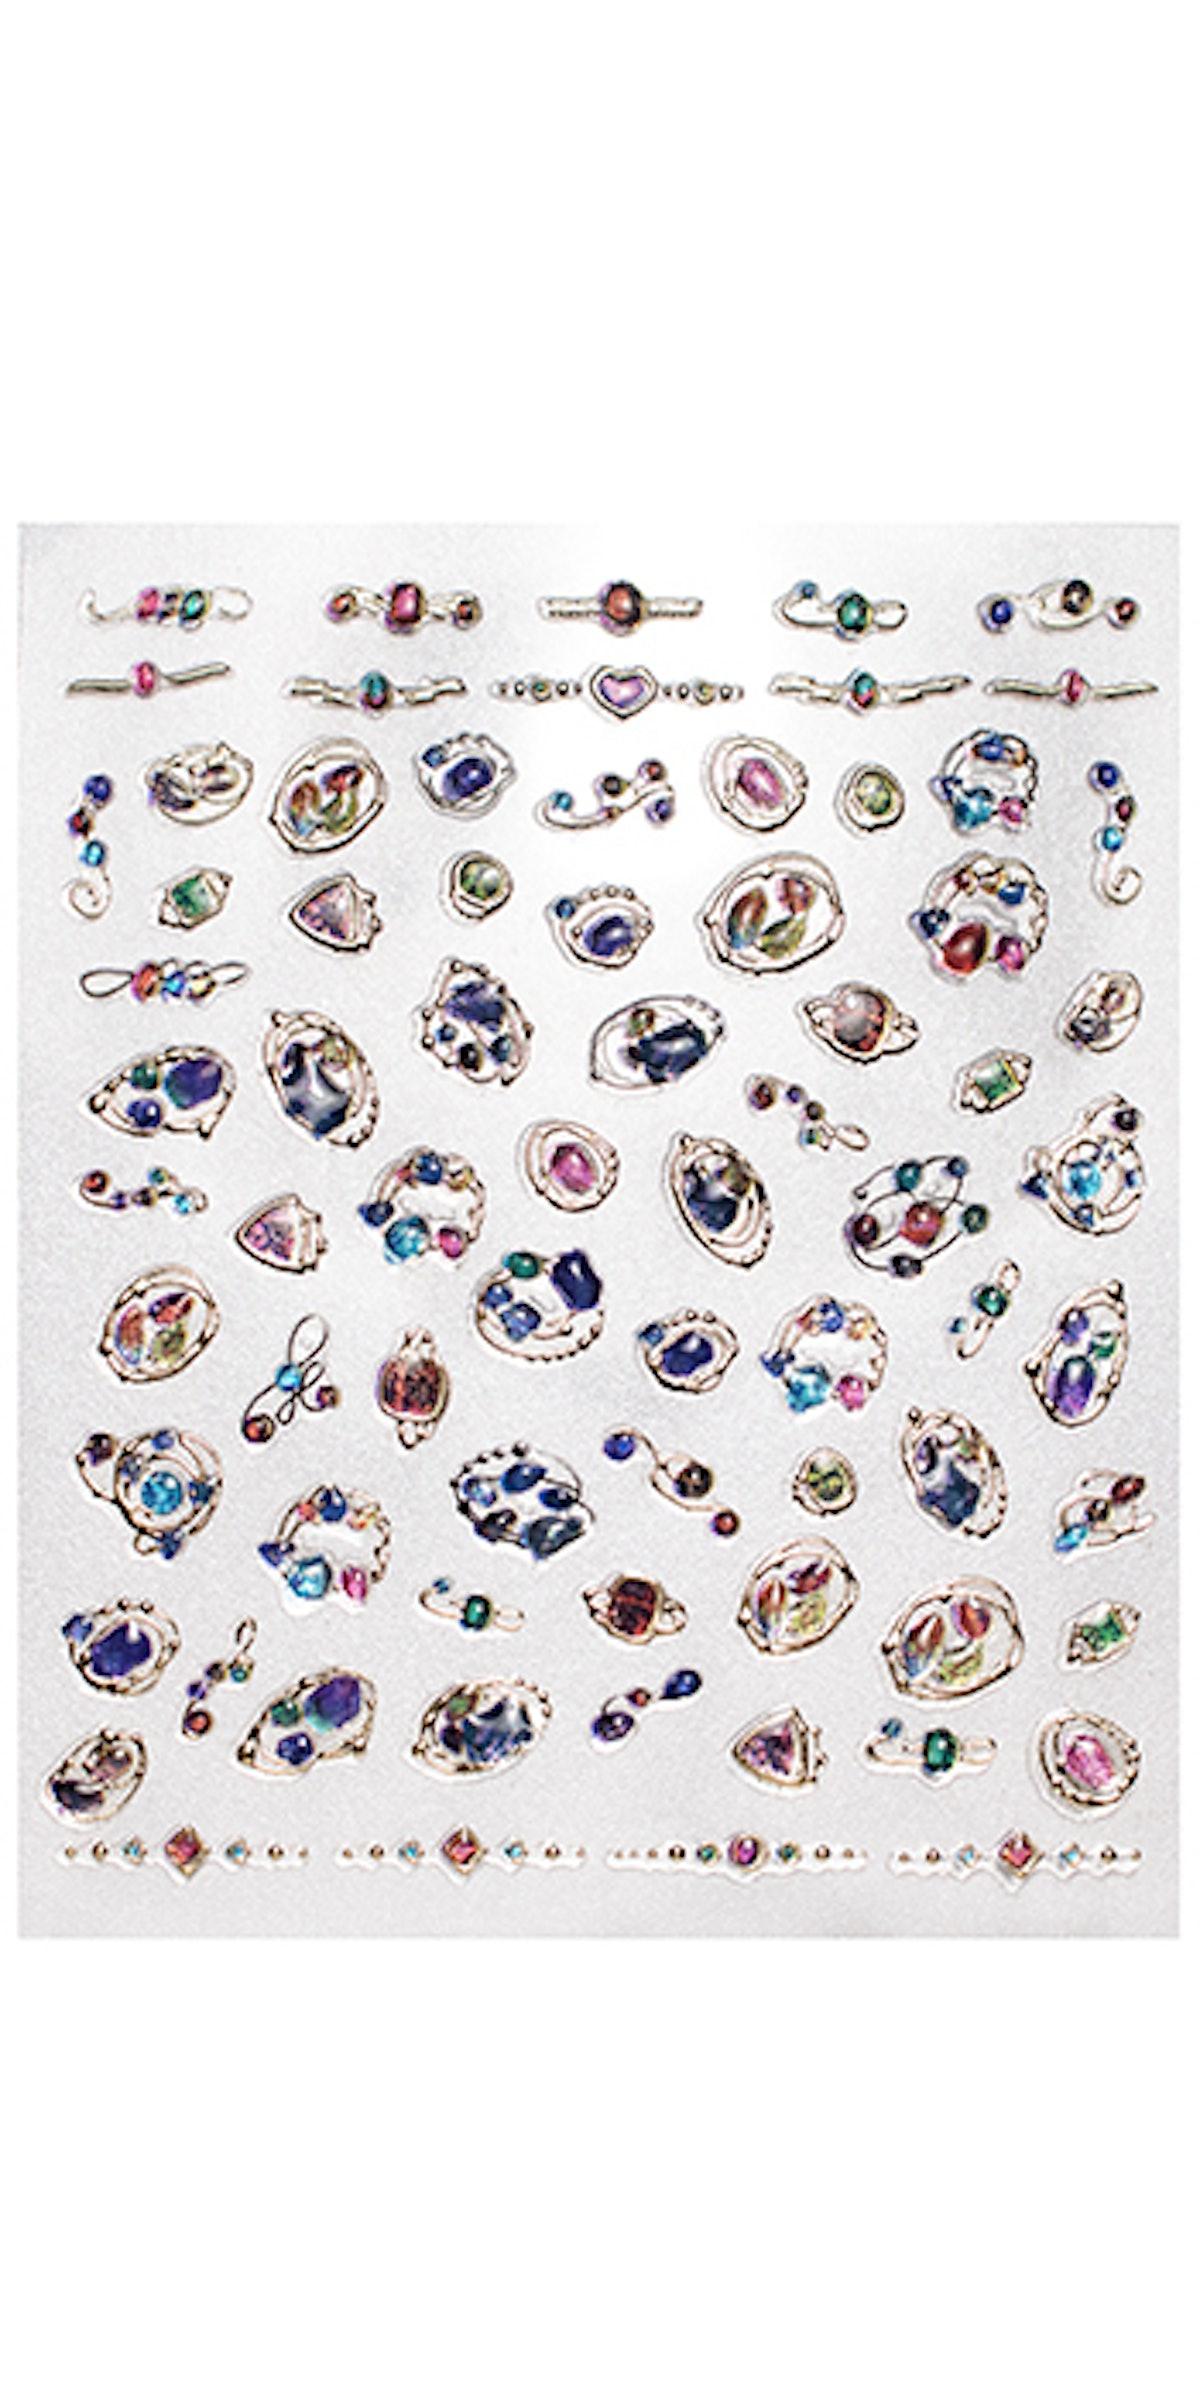 Bejeweled Nail Art Deco